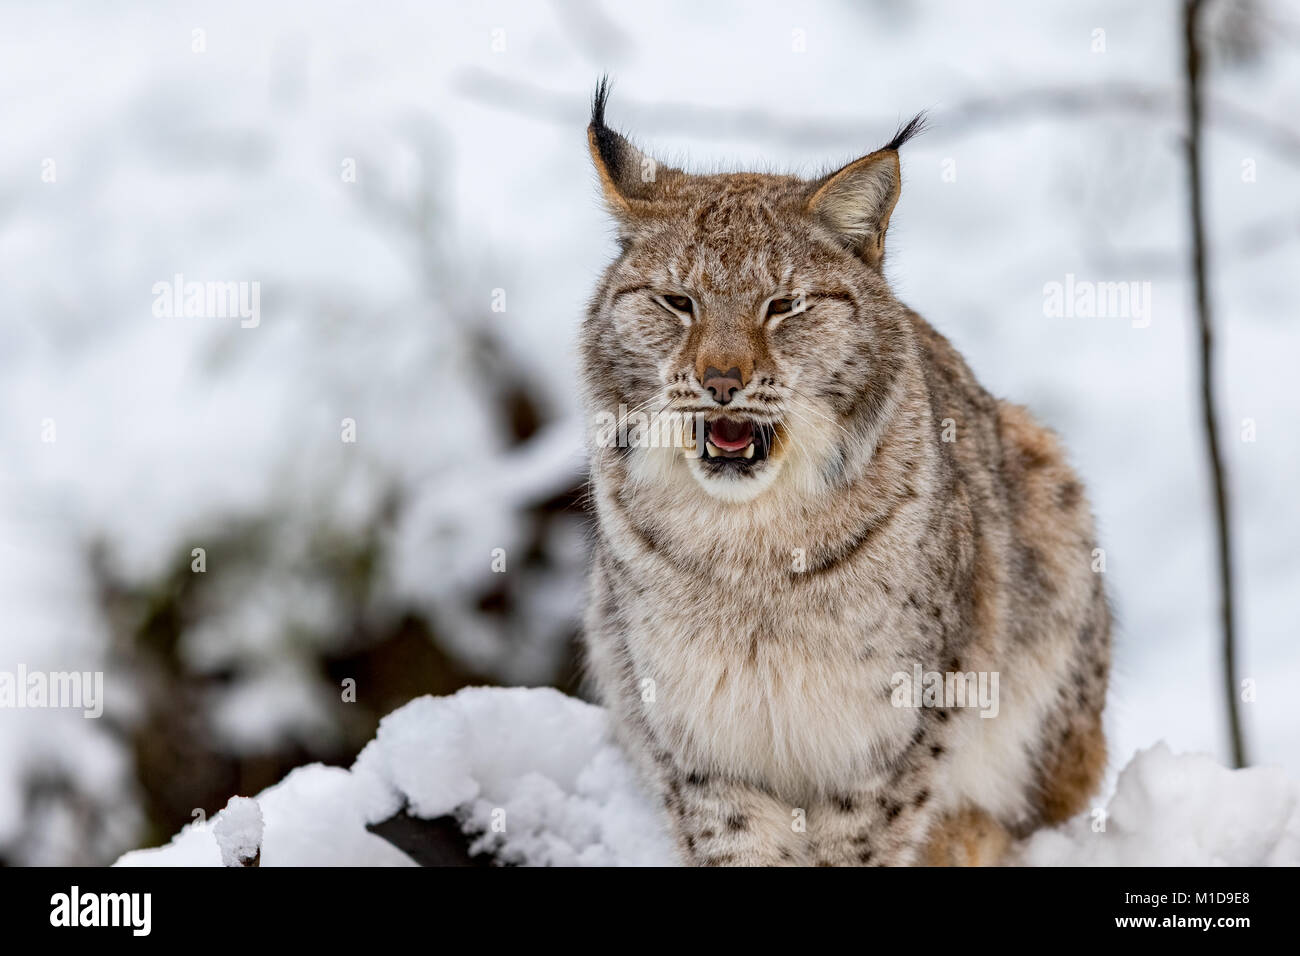 Eurasian Lynx, Lynx lynnx, in the snow, yawning - Stock Image